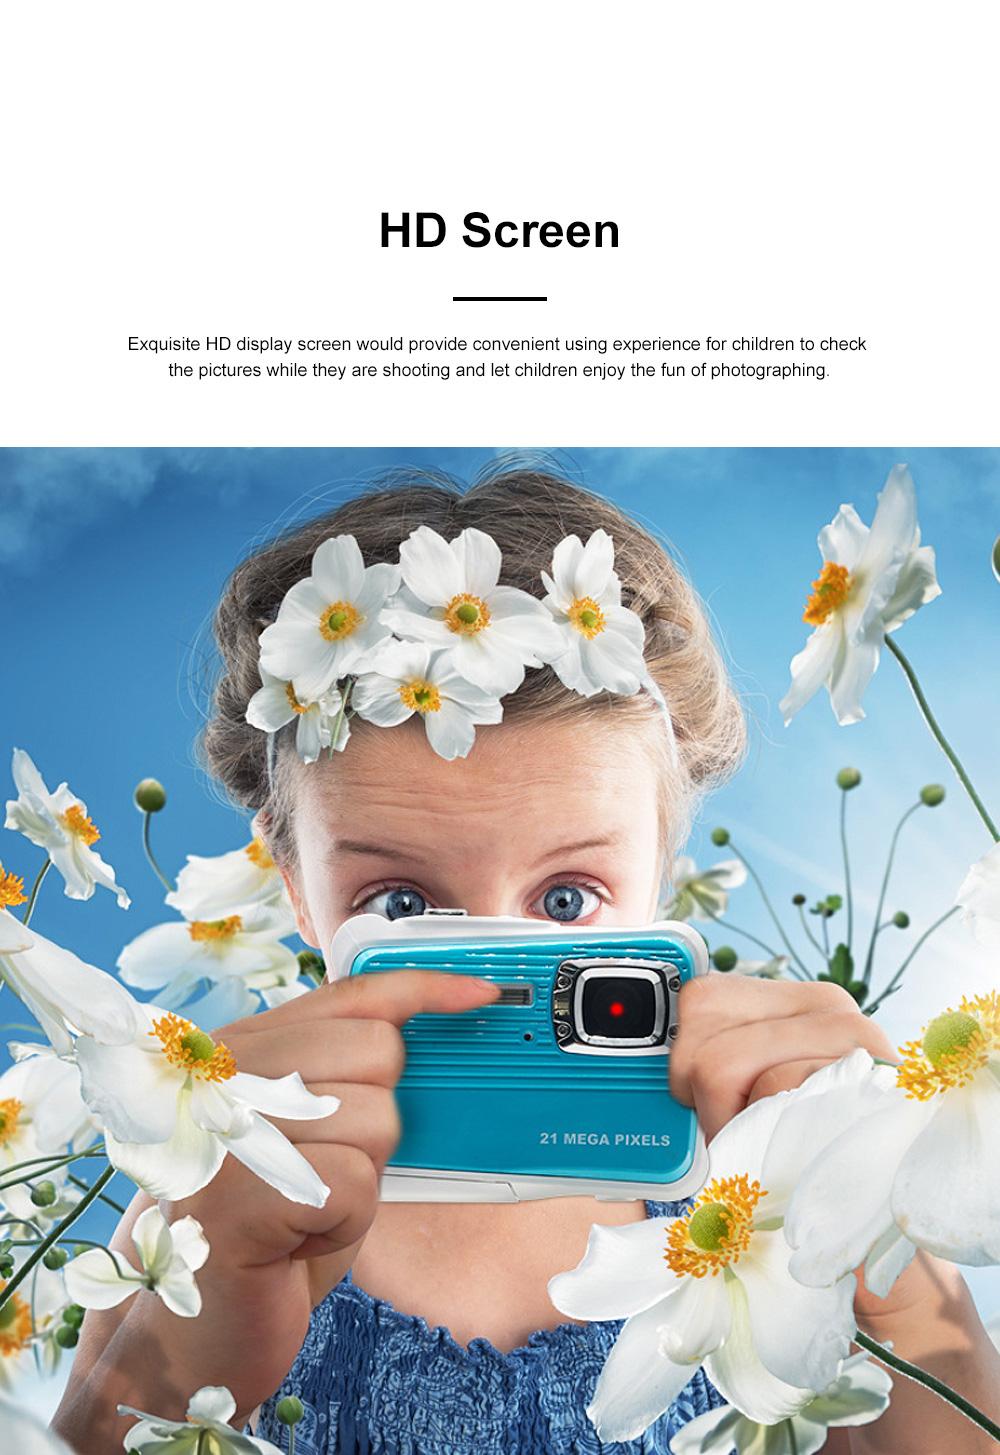 Delicate Portable Breaking-proof 3M Waterproof Children HD Digital Camera 21 Million Pixels Cam for Kids 1